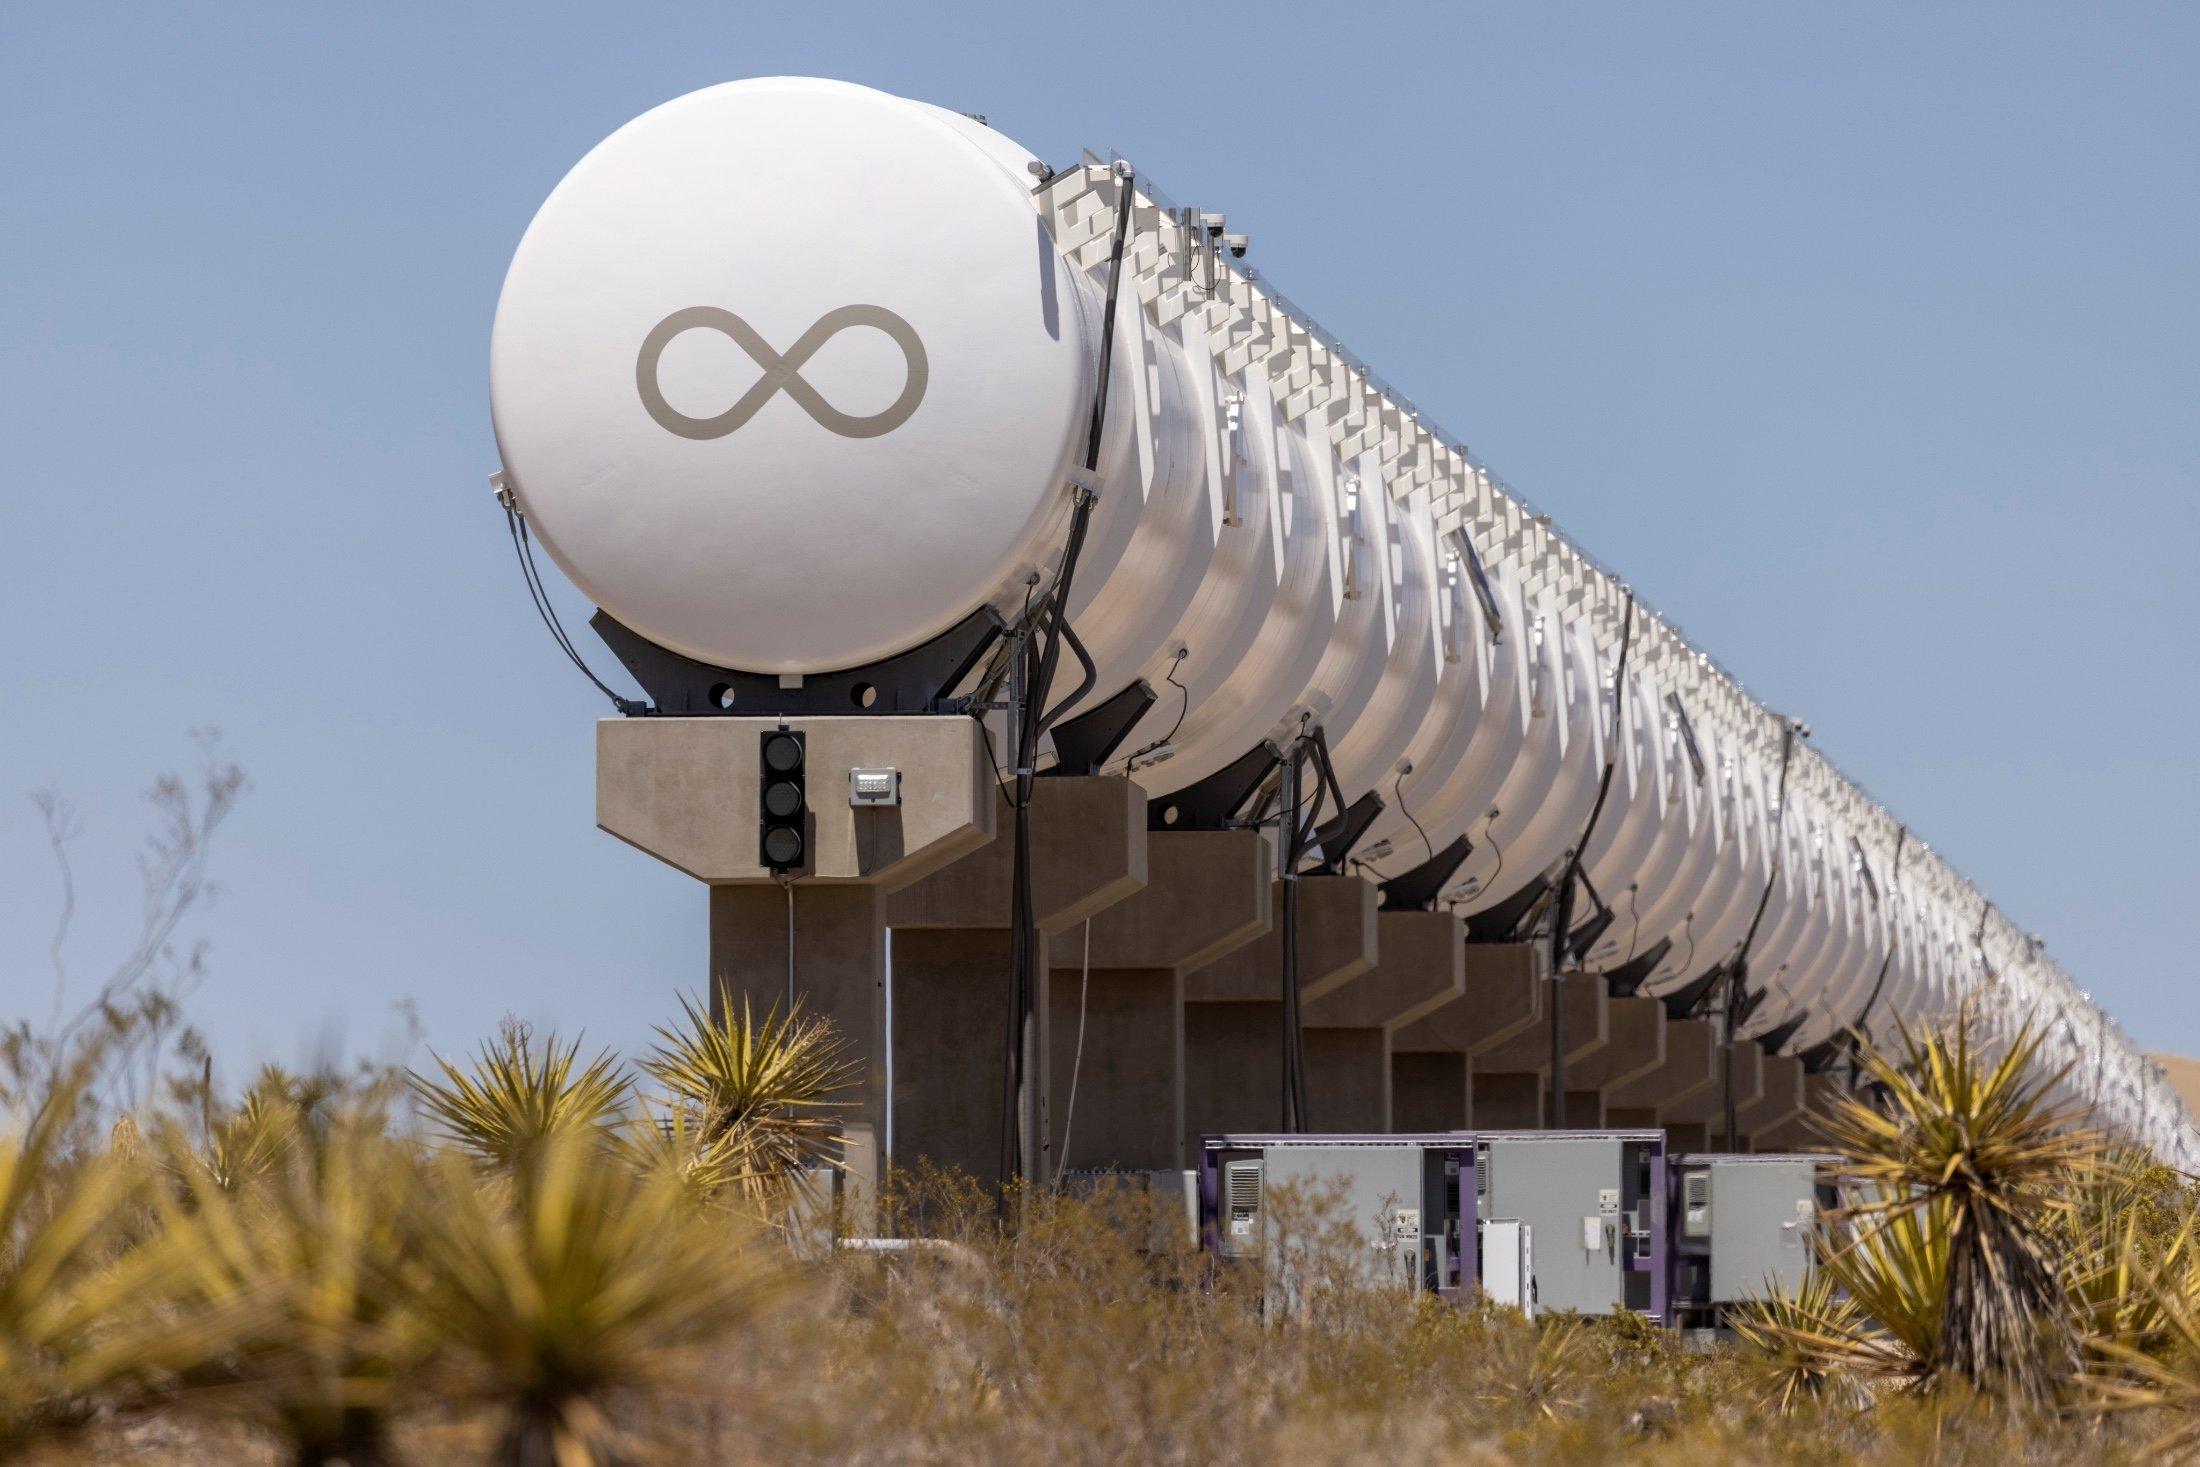 A test hyperloop tube is seeng at the Virgin Hyperloop facility near Las Vegas, Nevada, U.S., May 5, 2021. (Reuters Photo)